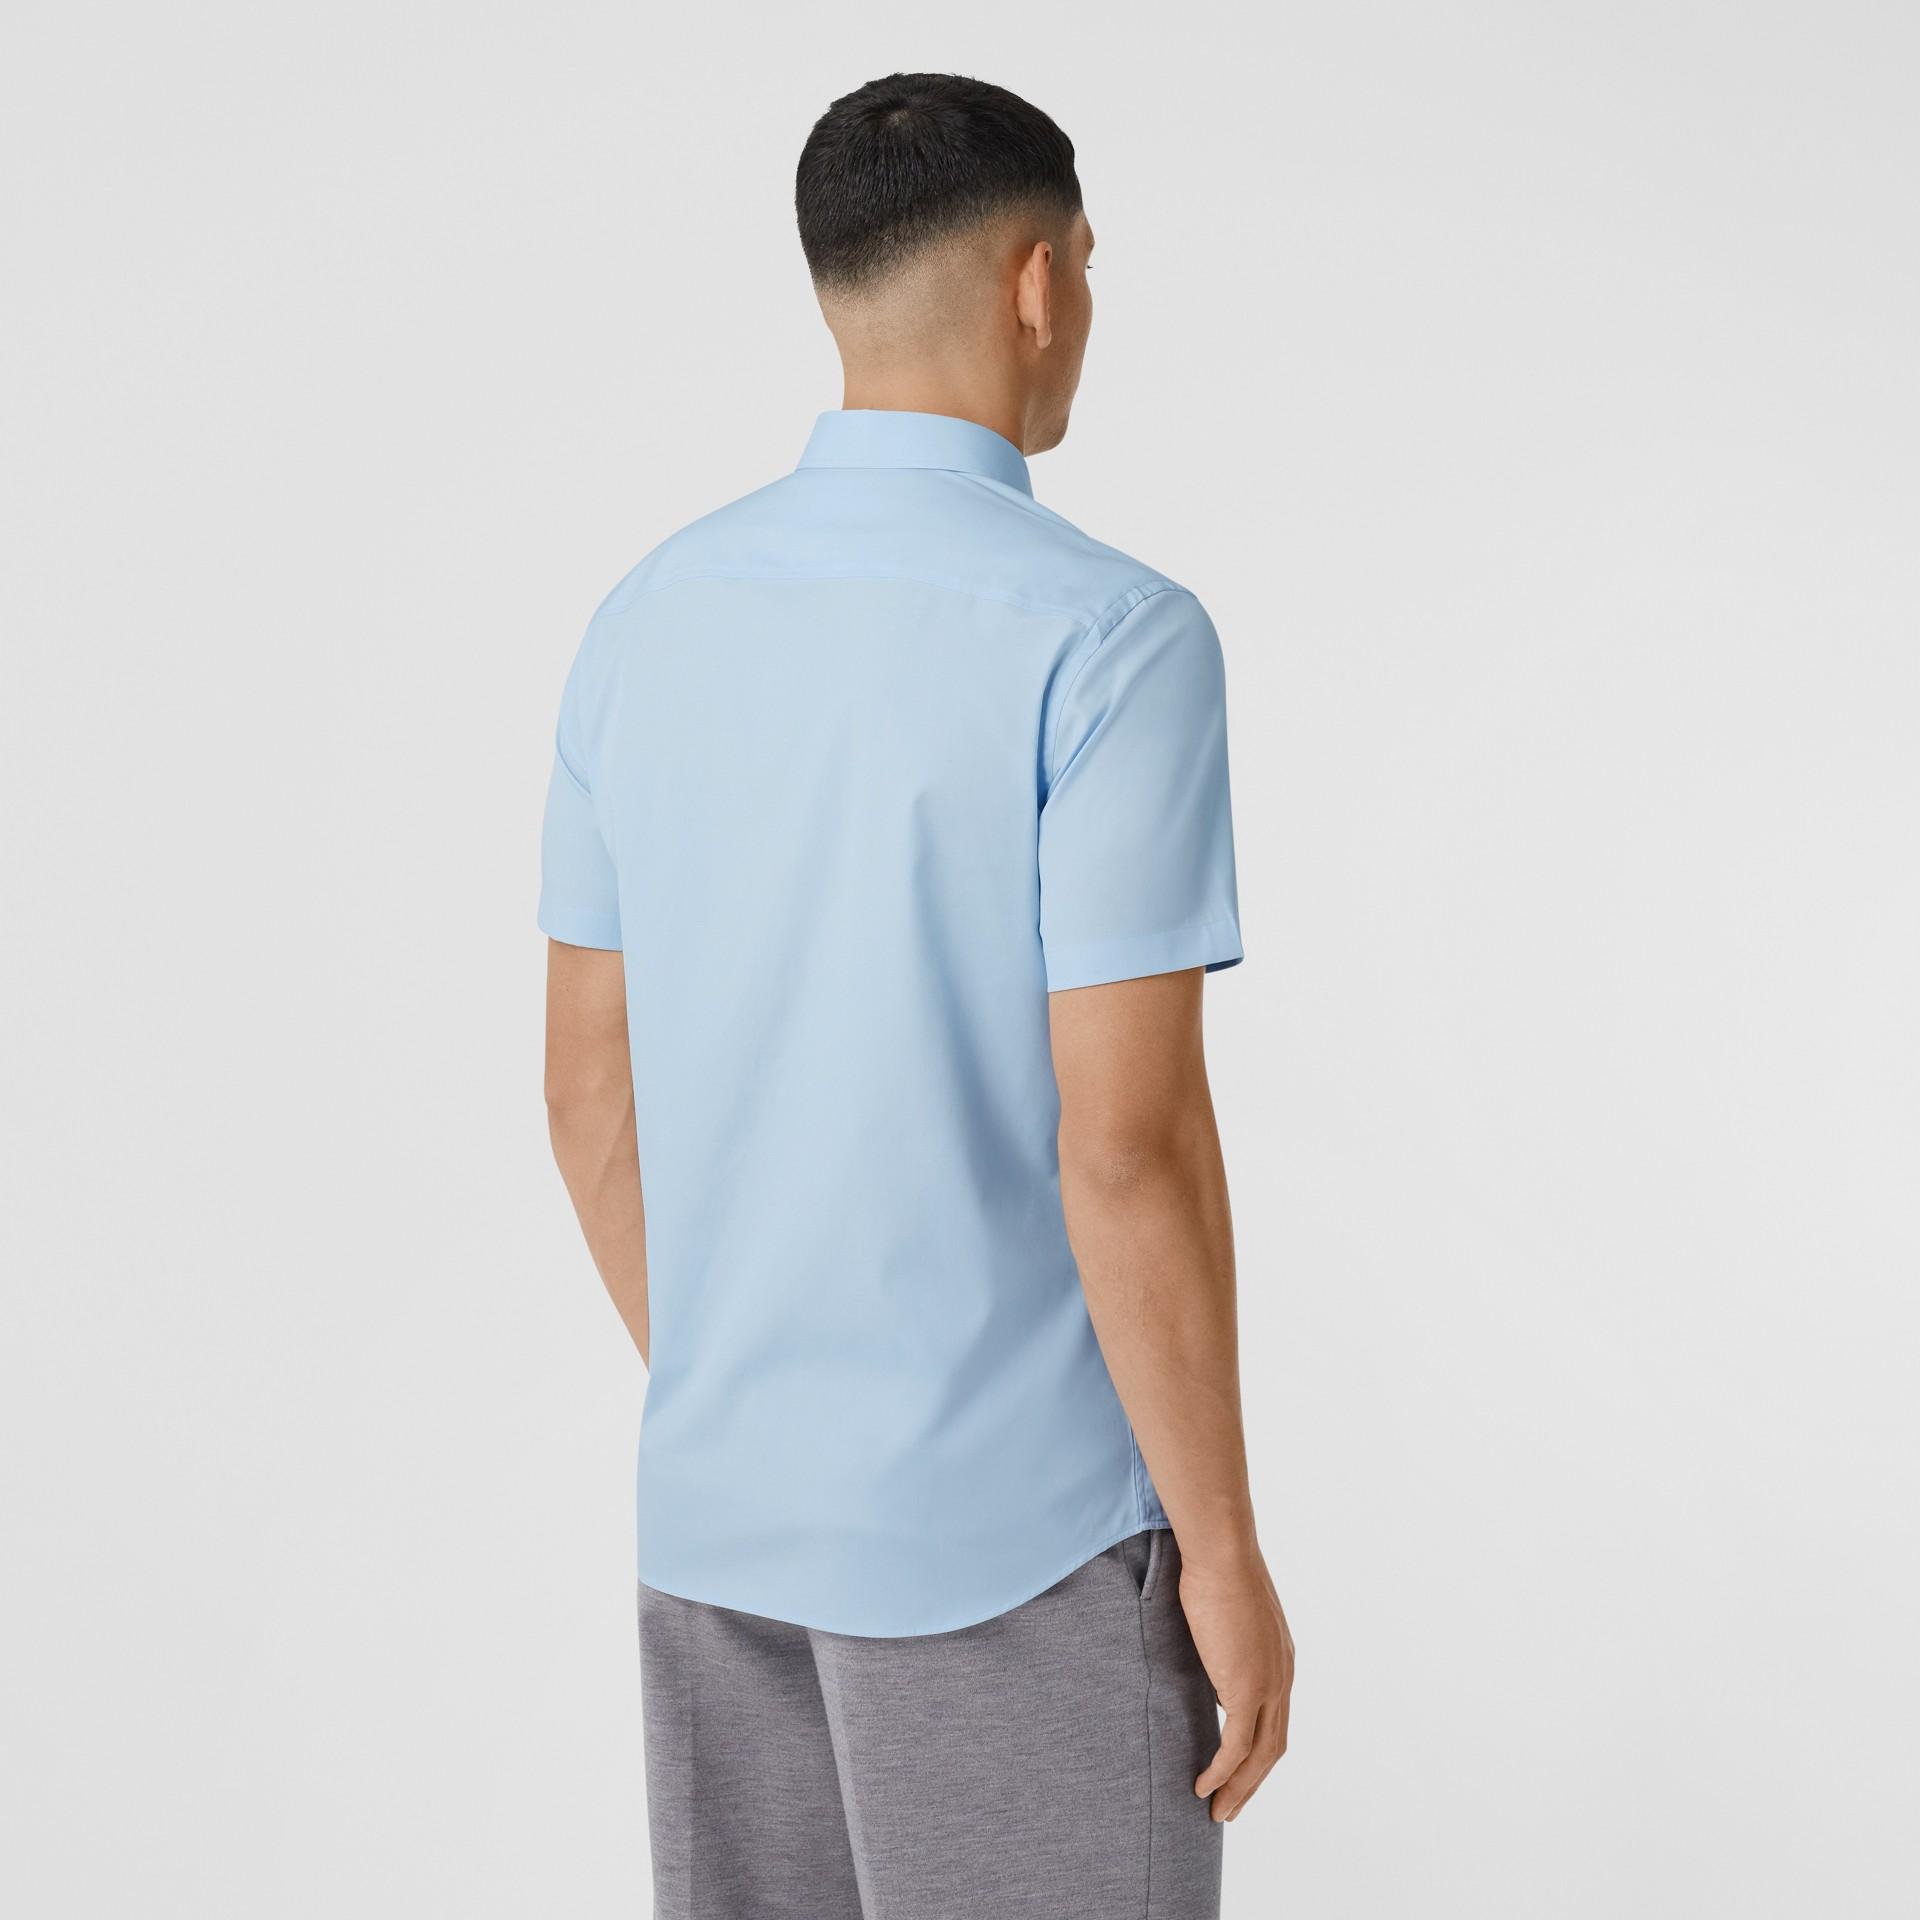 Short-sleeve Monogram Motif Stretch Cotton Shirt in Pale Blue - Men | Burberry United Kingdom - gallery image 2